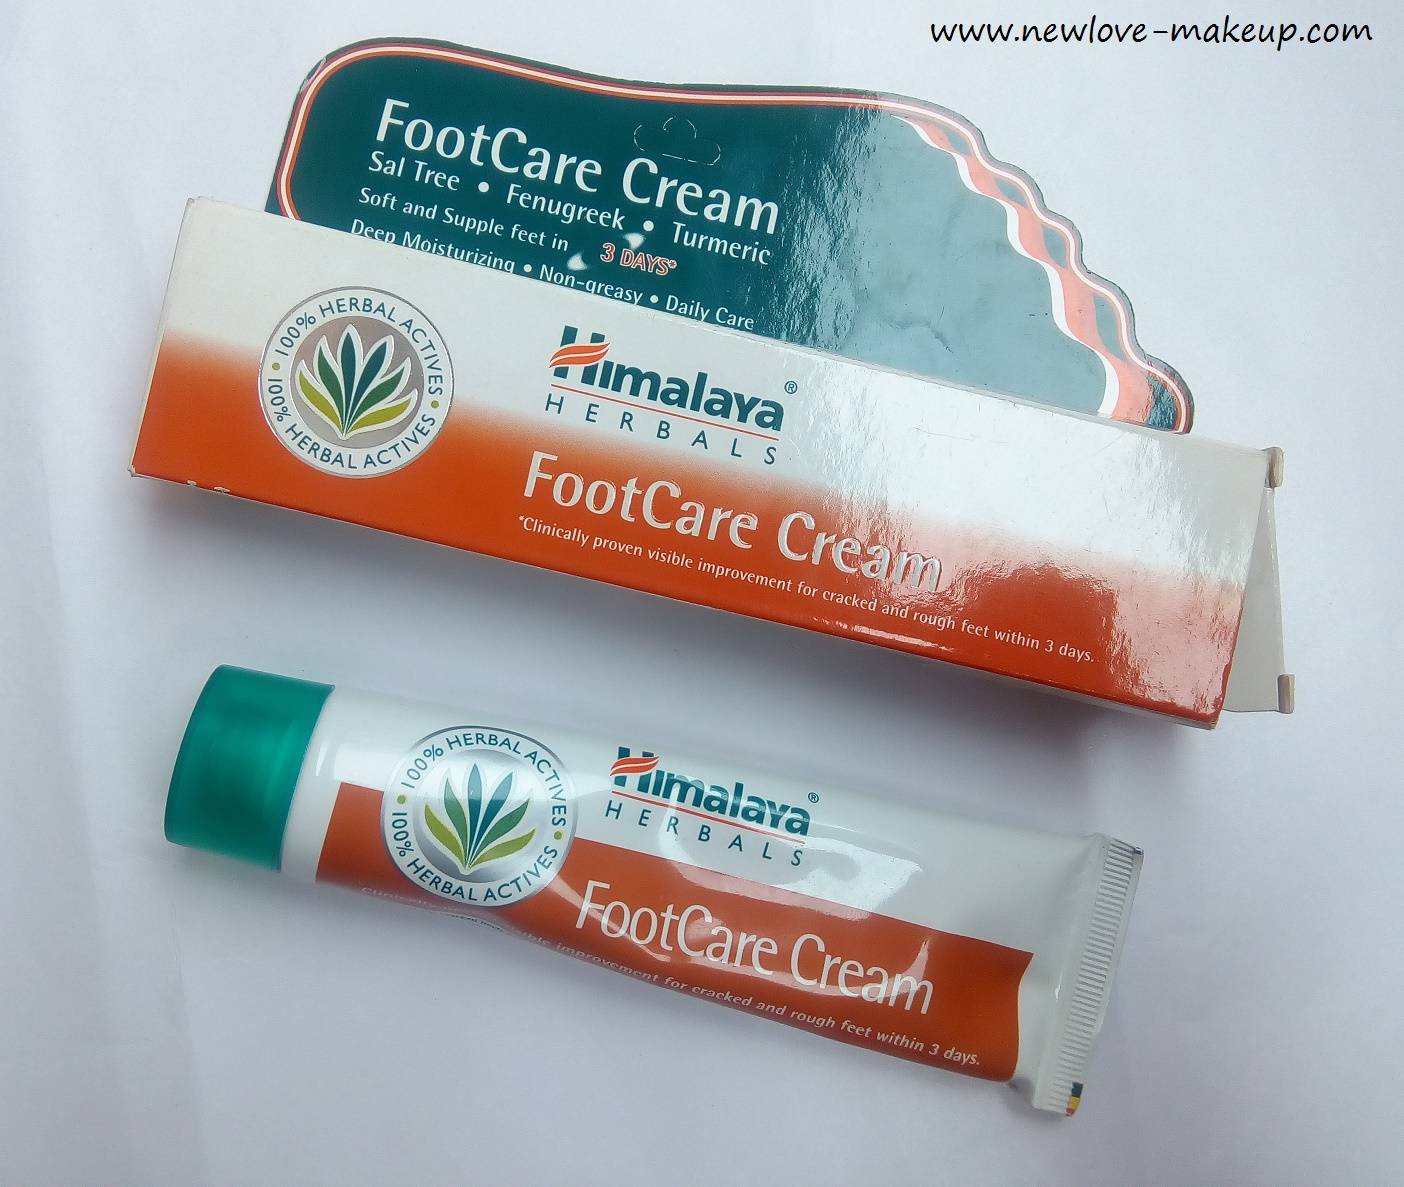 Liz Face Earle Cream